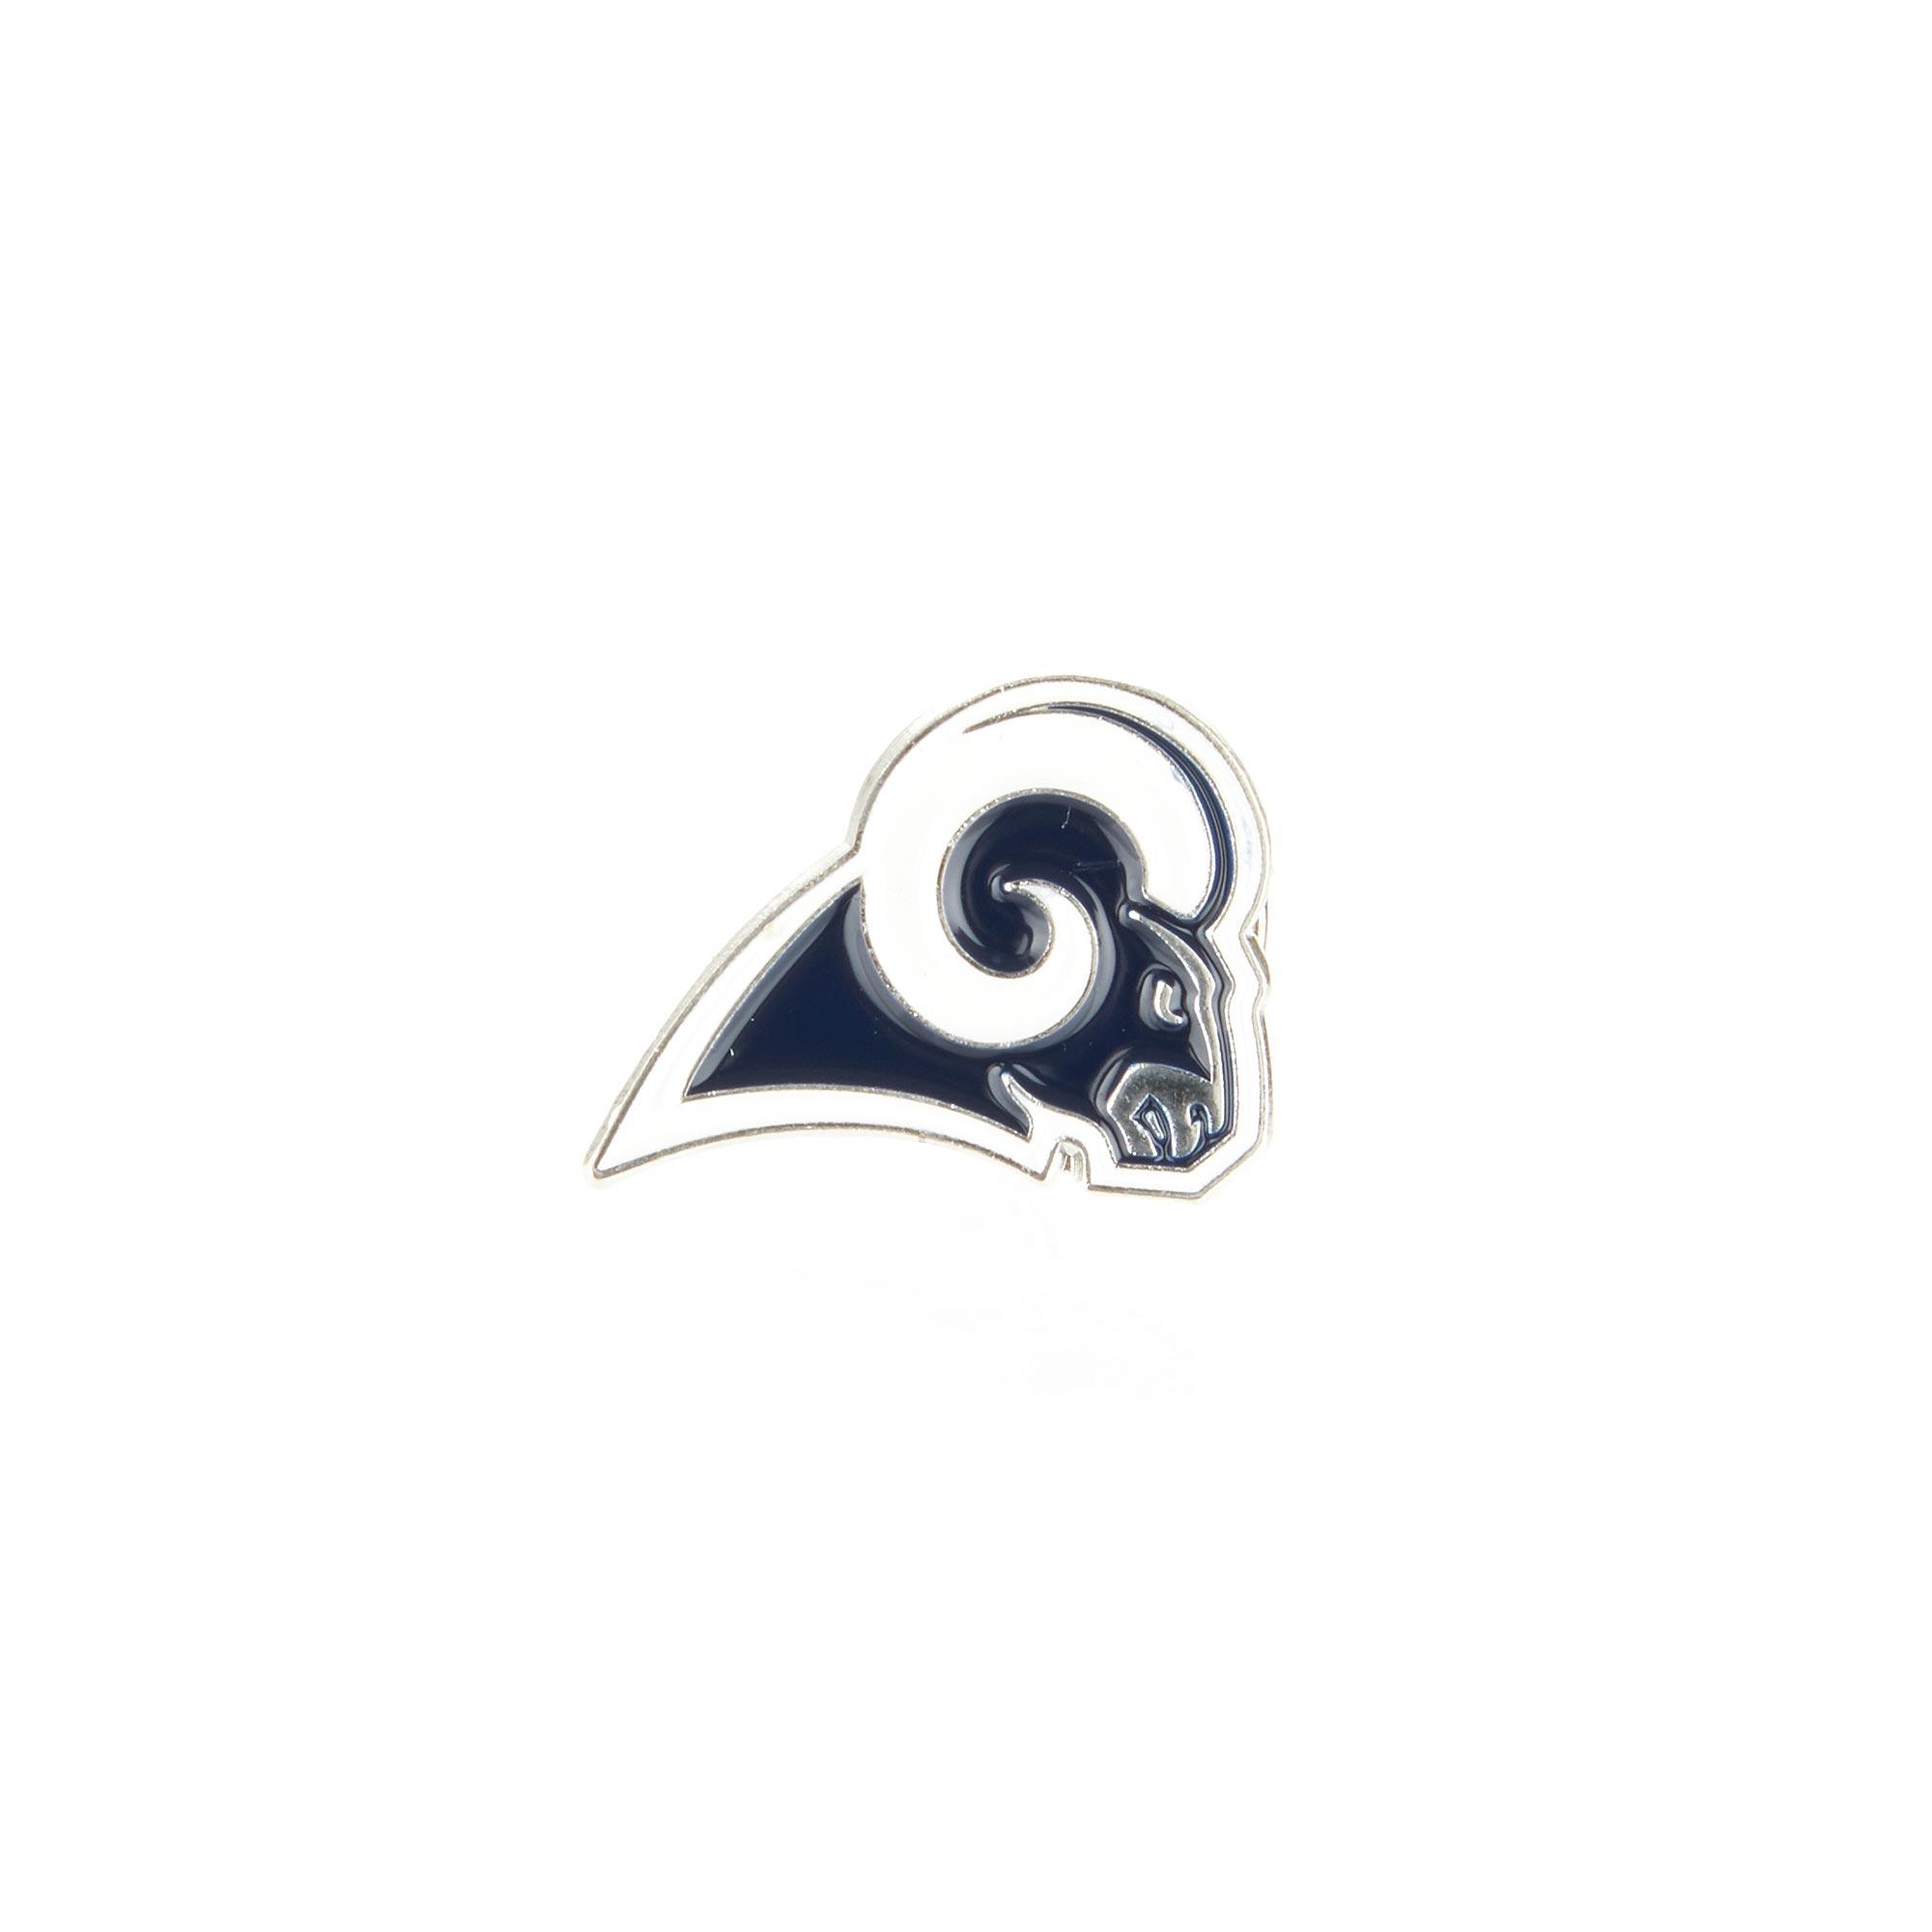 Los Angeles Rams Logo Pin Badge